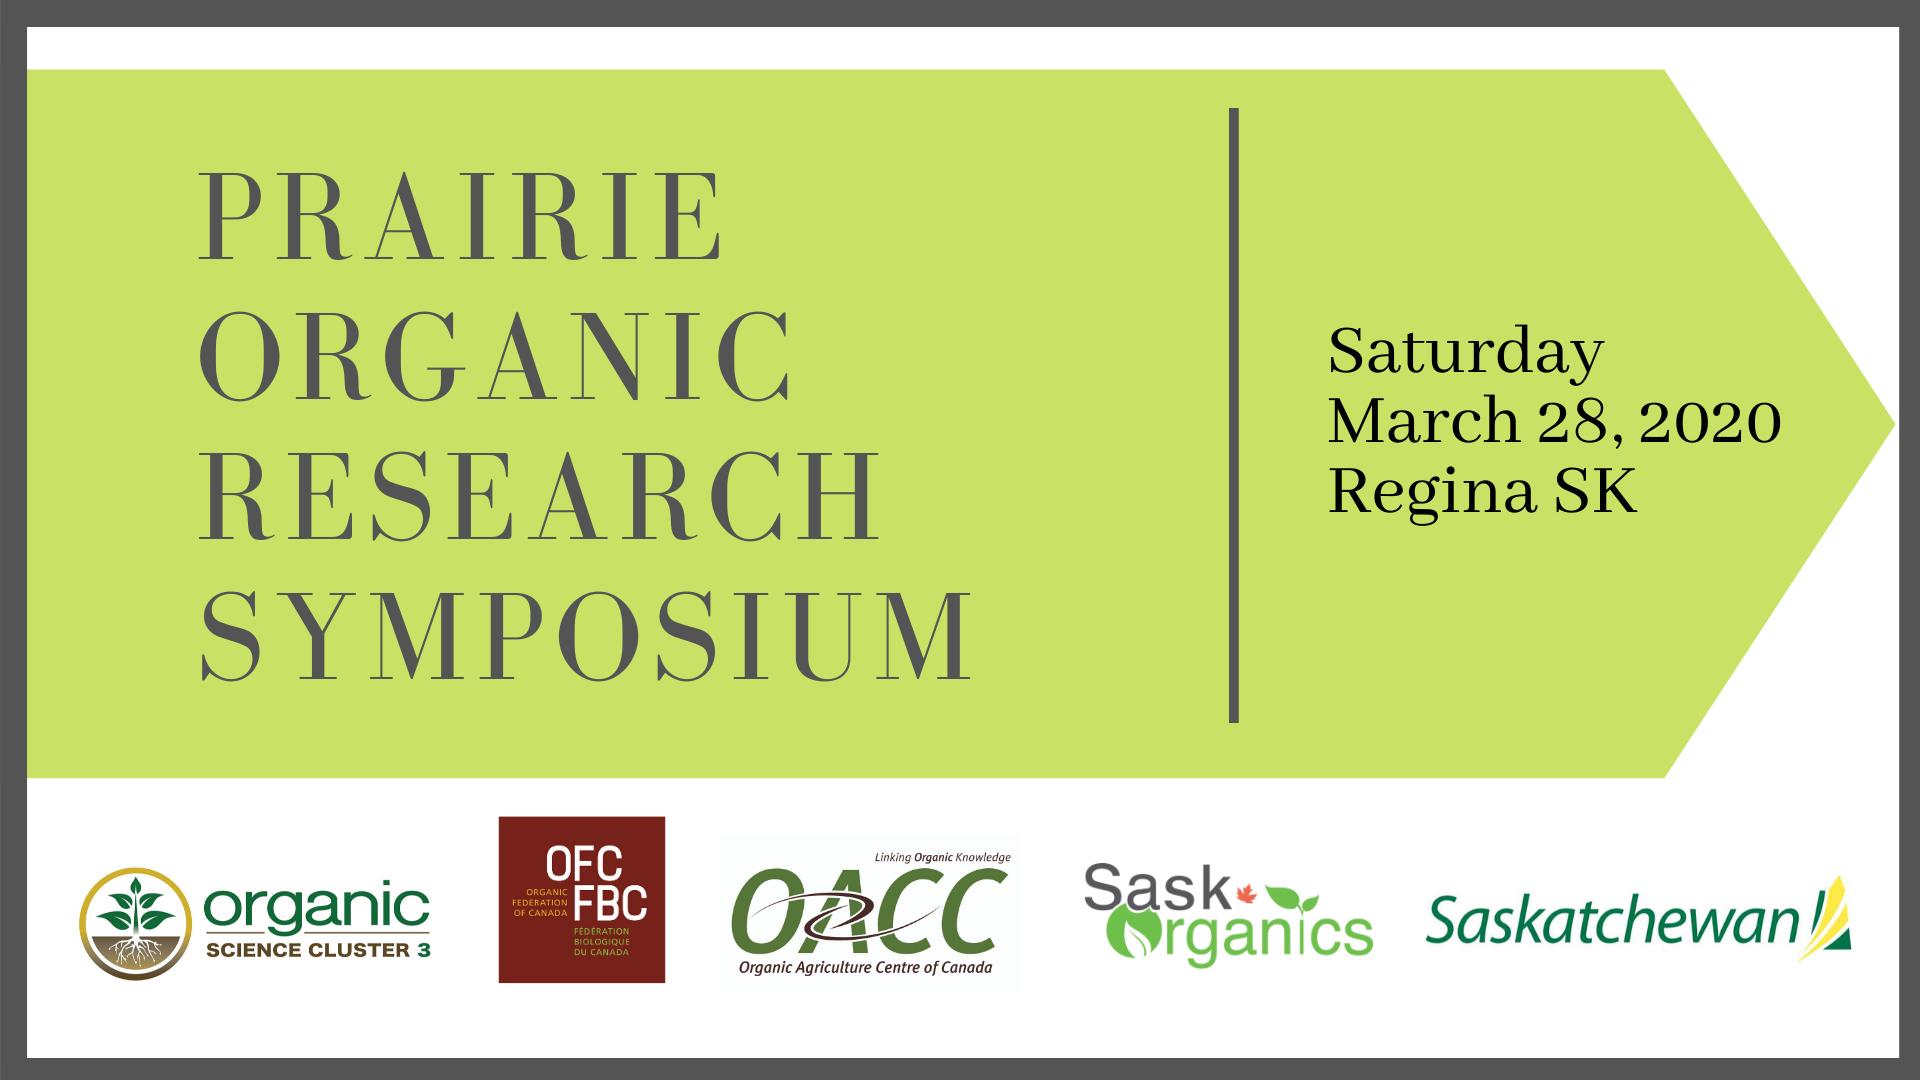 Prairie Organic Research Symposium